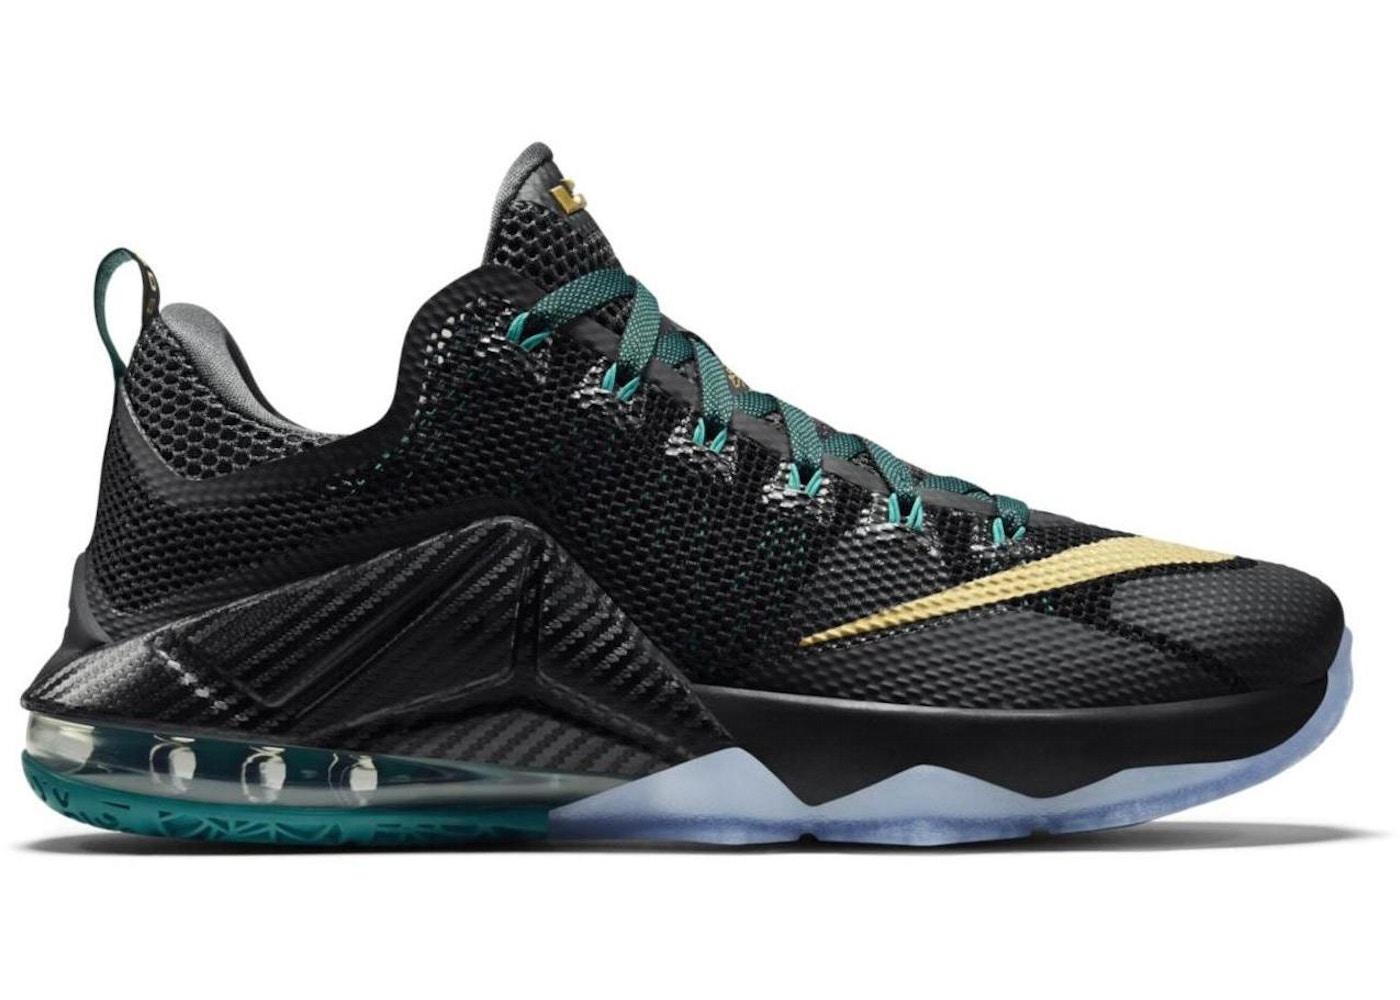 d1b0795e4d08 Buy Nike LeBron 12 Shoes   Deadstock Sneakers